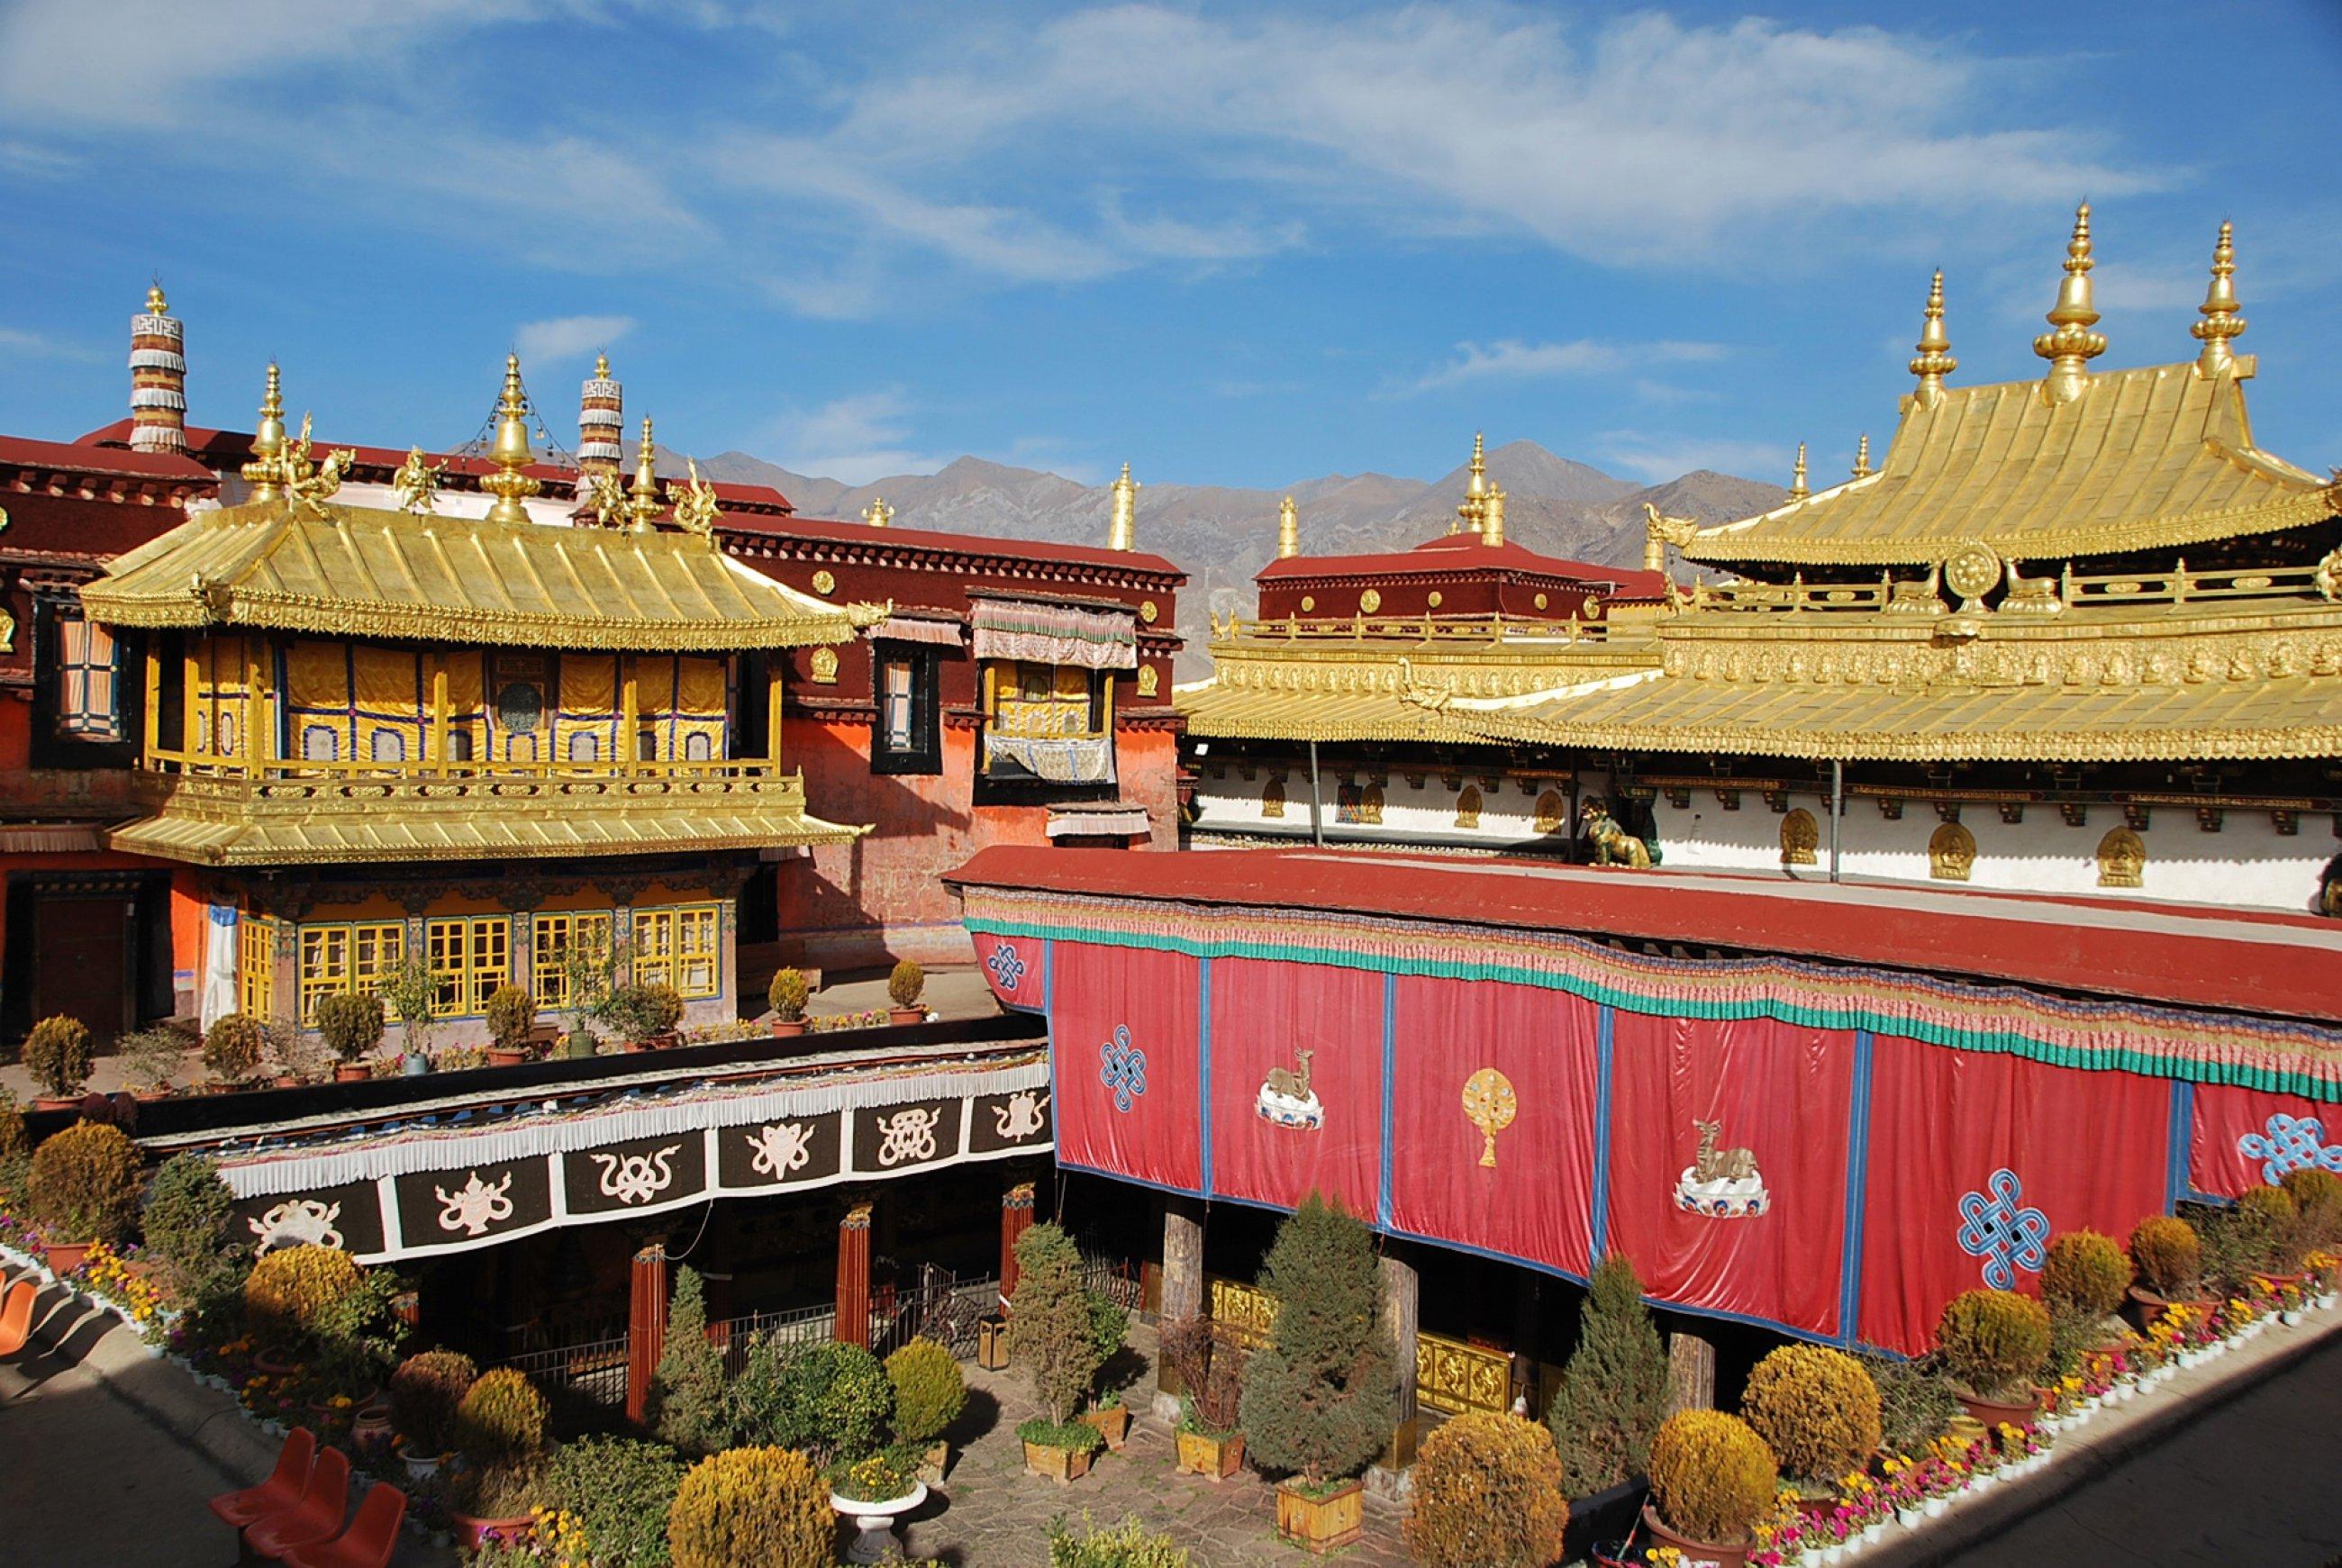 https://bubo.sk/uploads/galleries/16319/tibet-lhasa-ctni-11-2014-mirka-sulka-128-.jpg